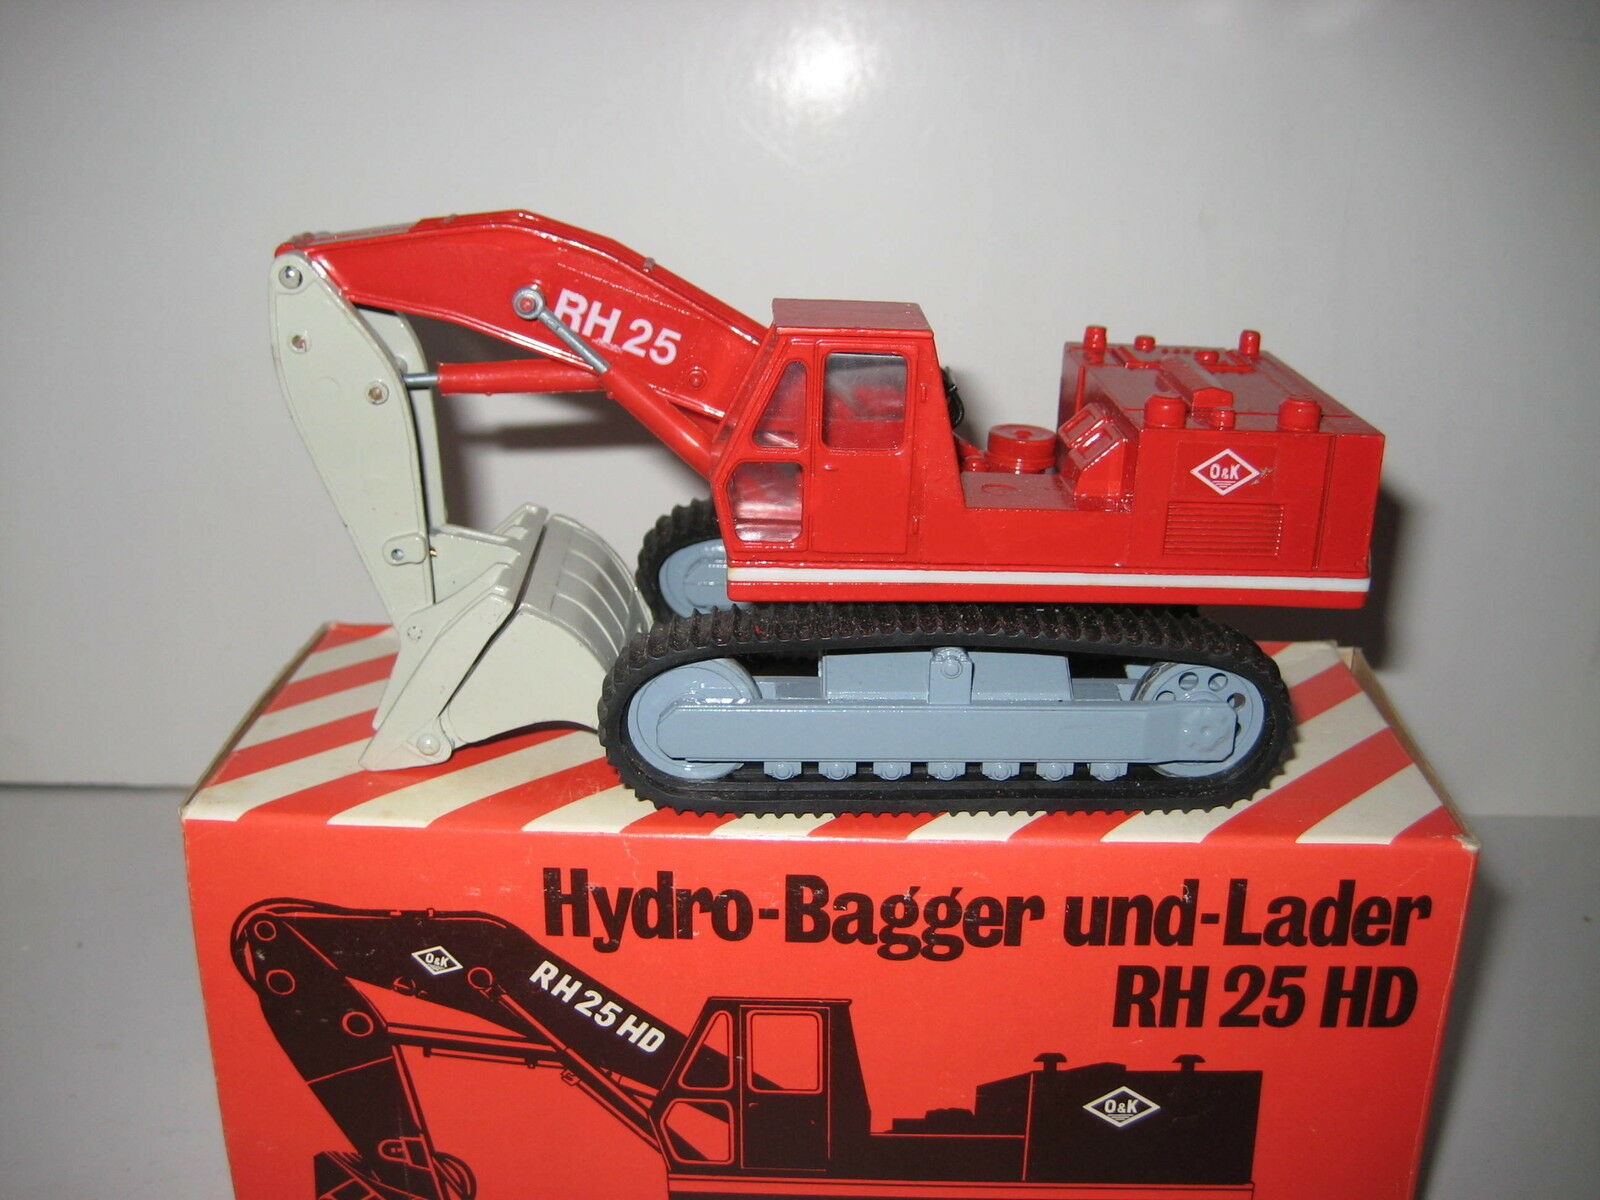 O&K RH 25 BAGGER BAGGER BAGGER HOCHLÖFFEL RAUPEN 1.VERSION RW ZISS 1 50 OVP 0ac331